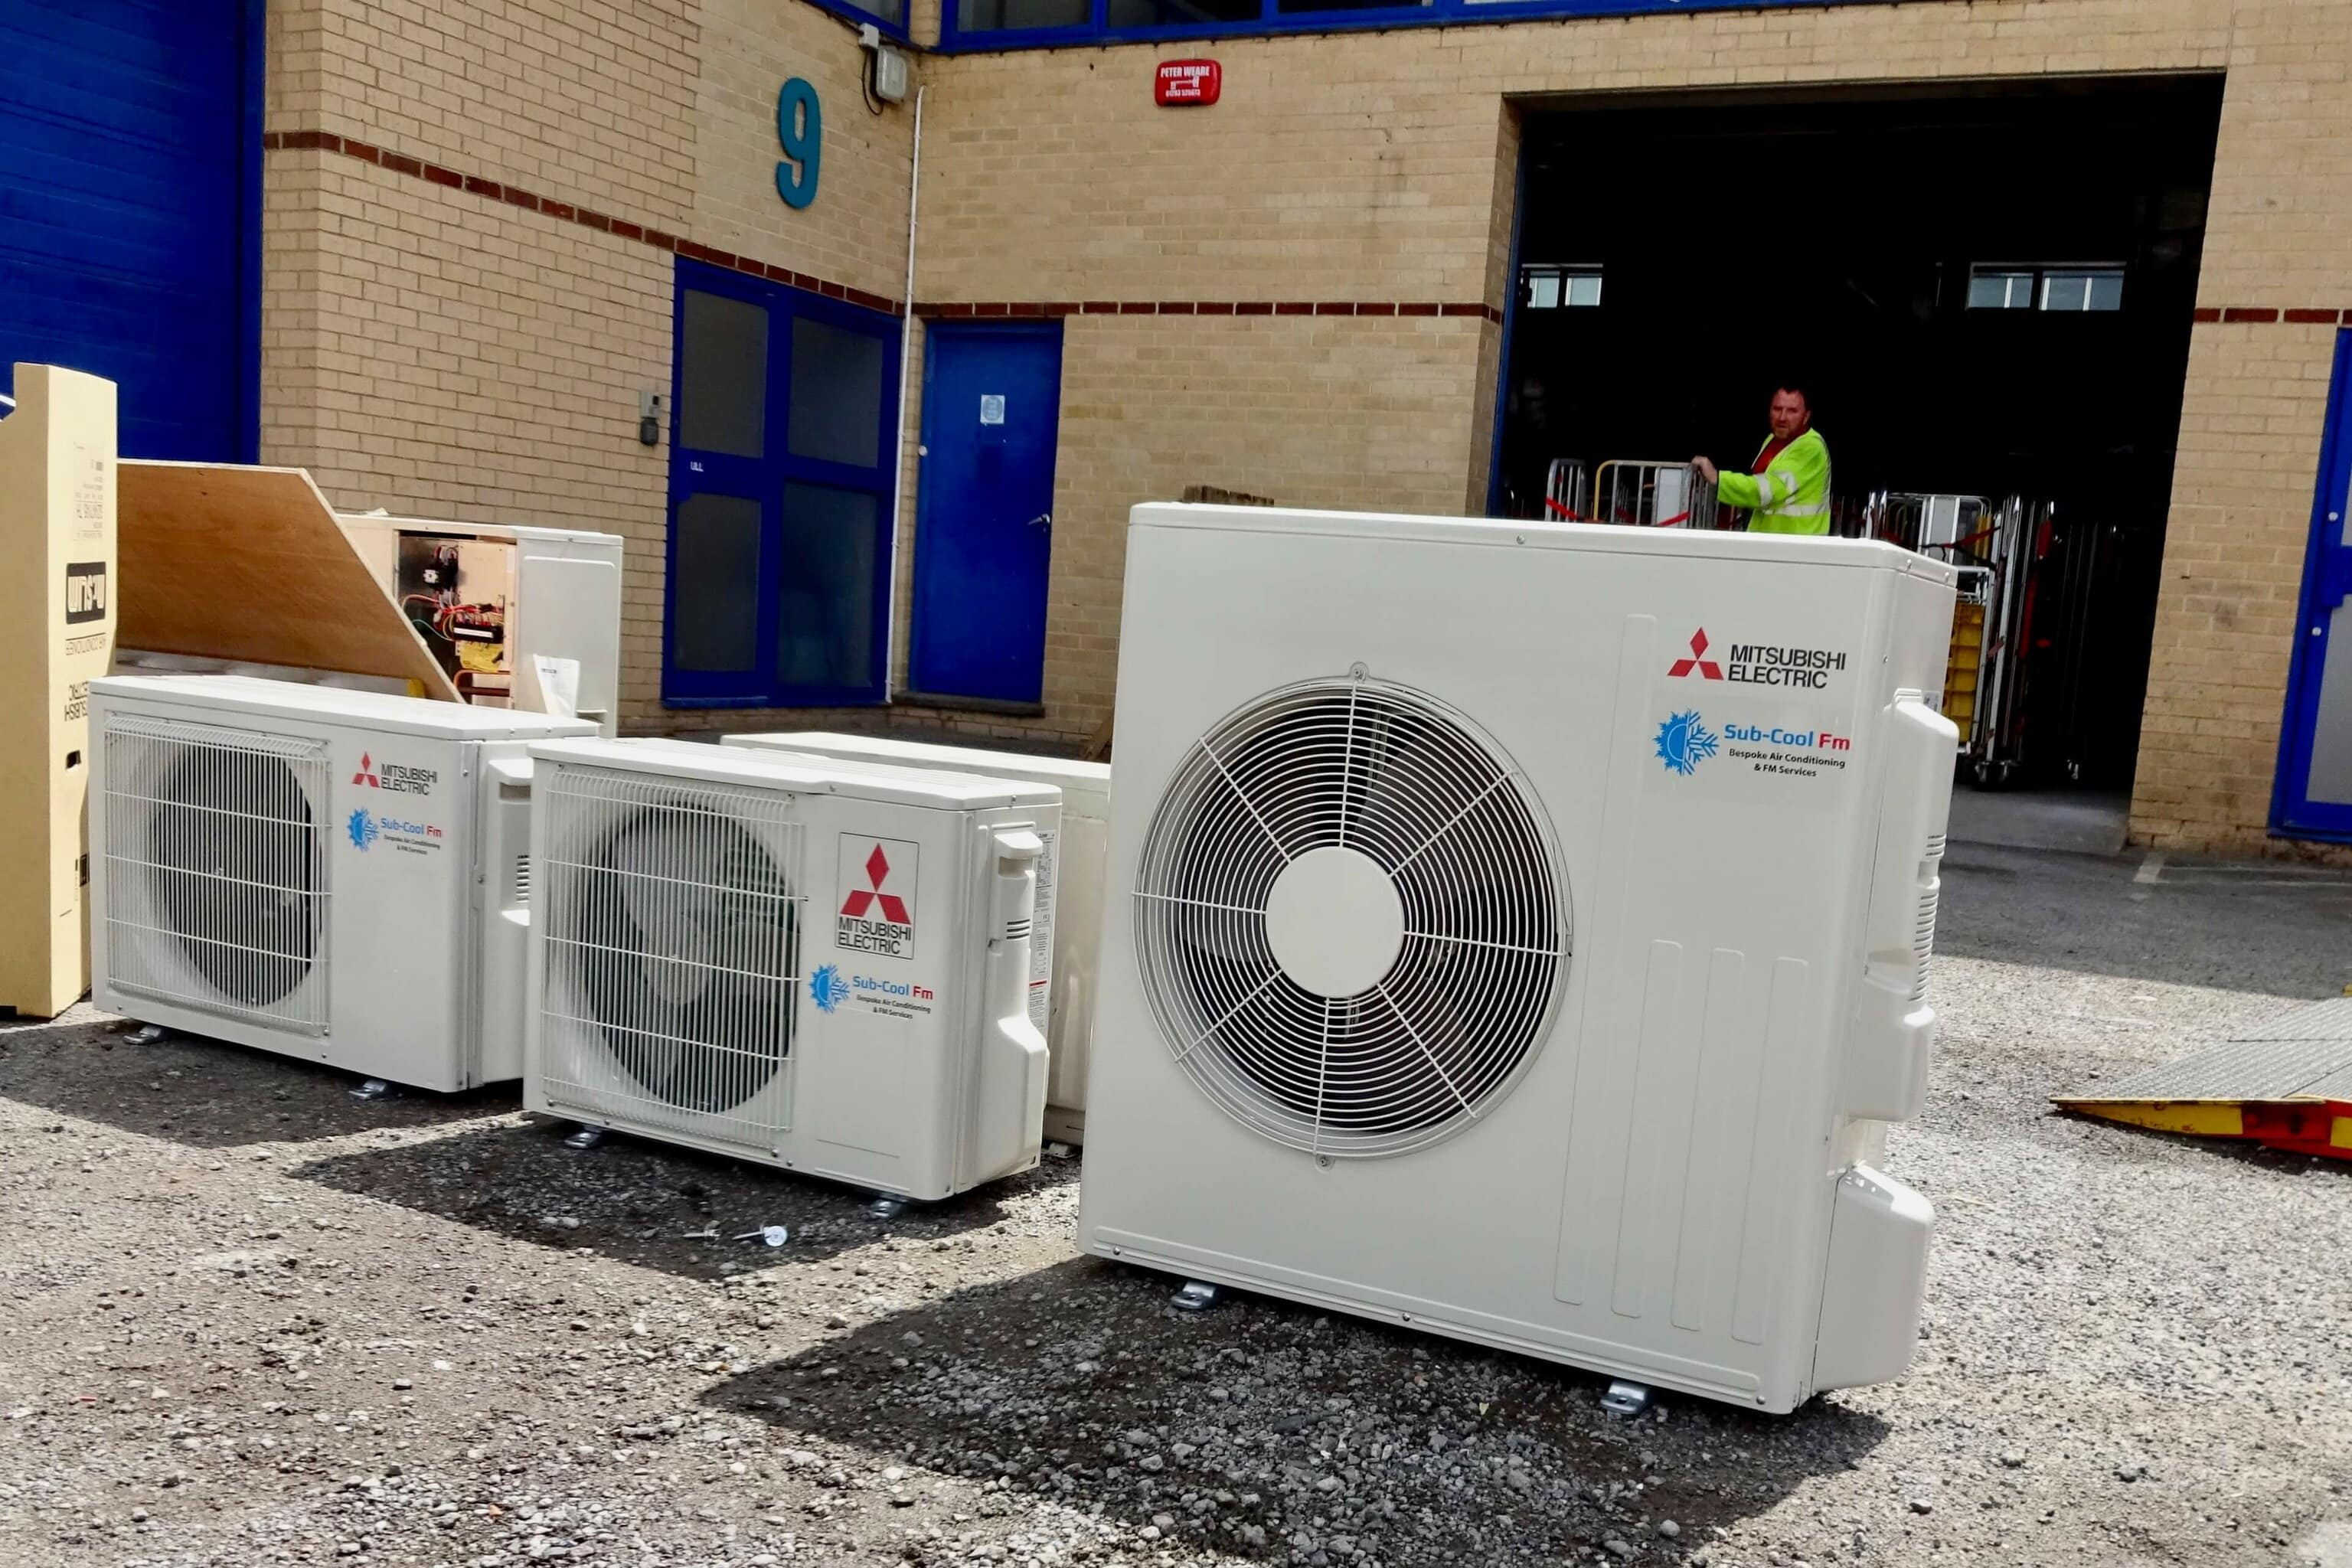 Brand new Mitsubishi air conditioning units